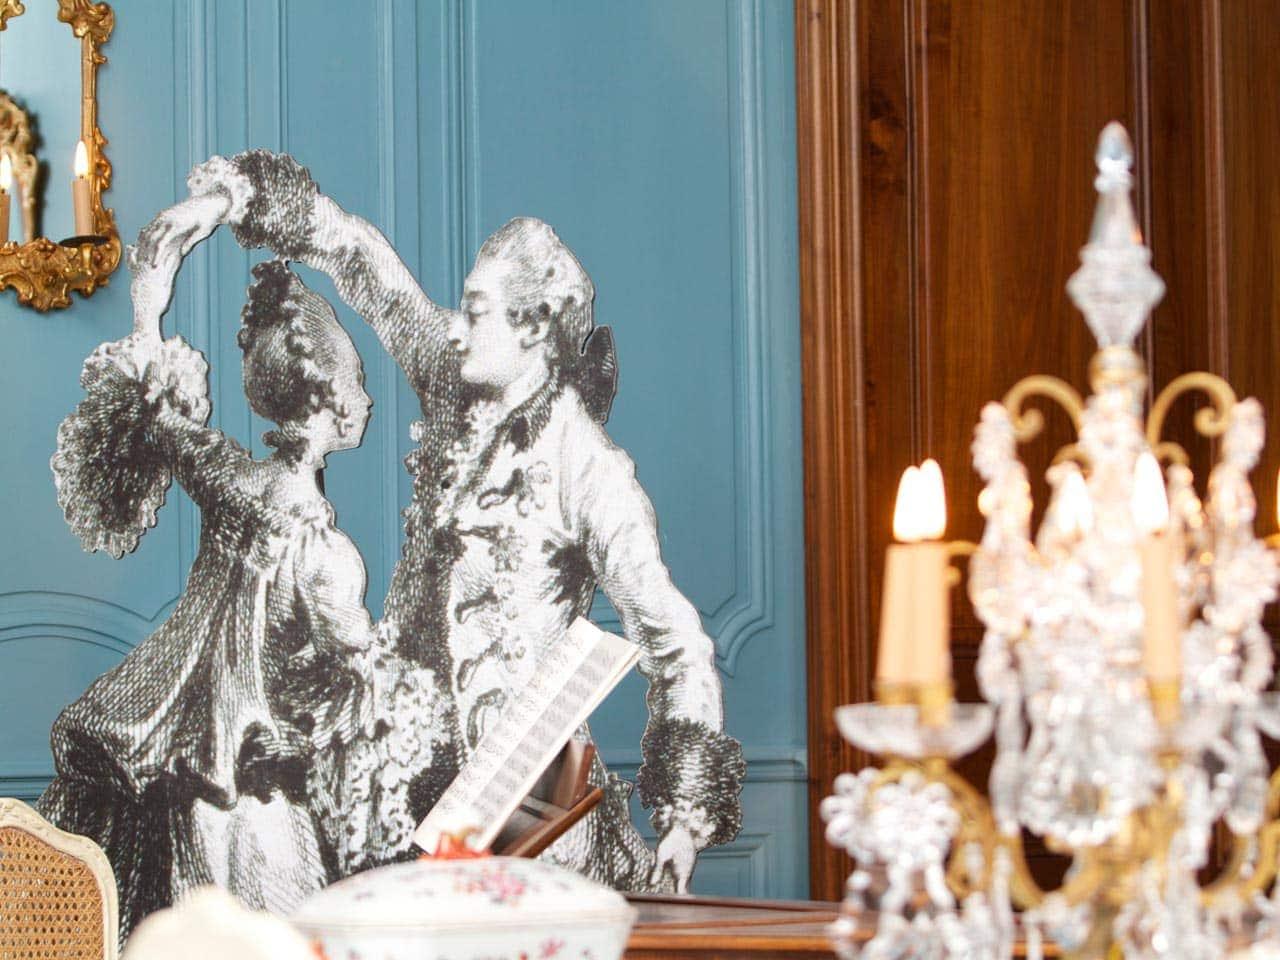 Château de Prangins – ein wahres Denkmal